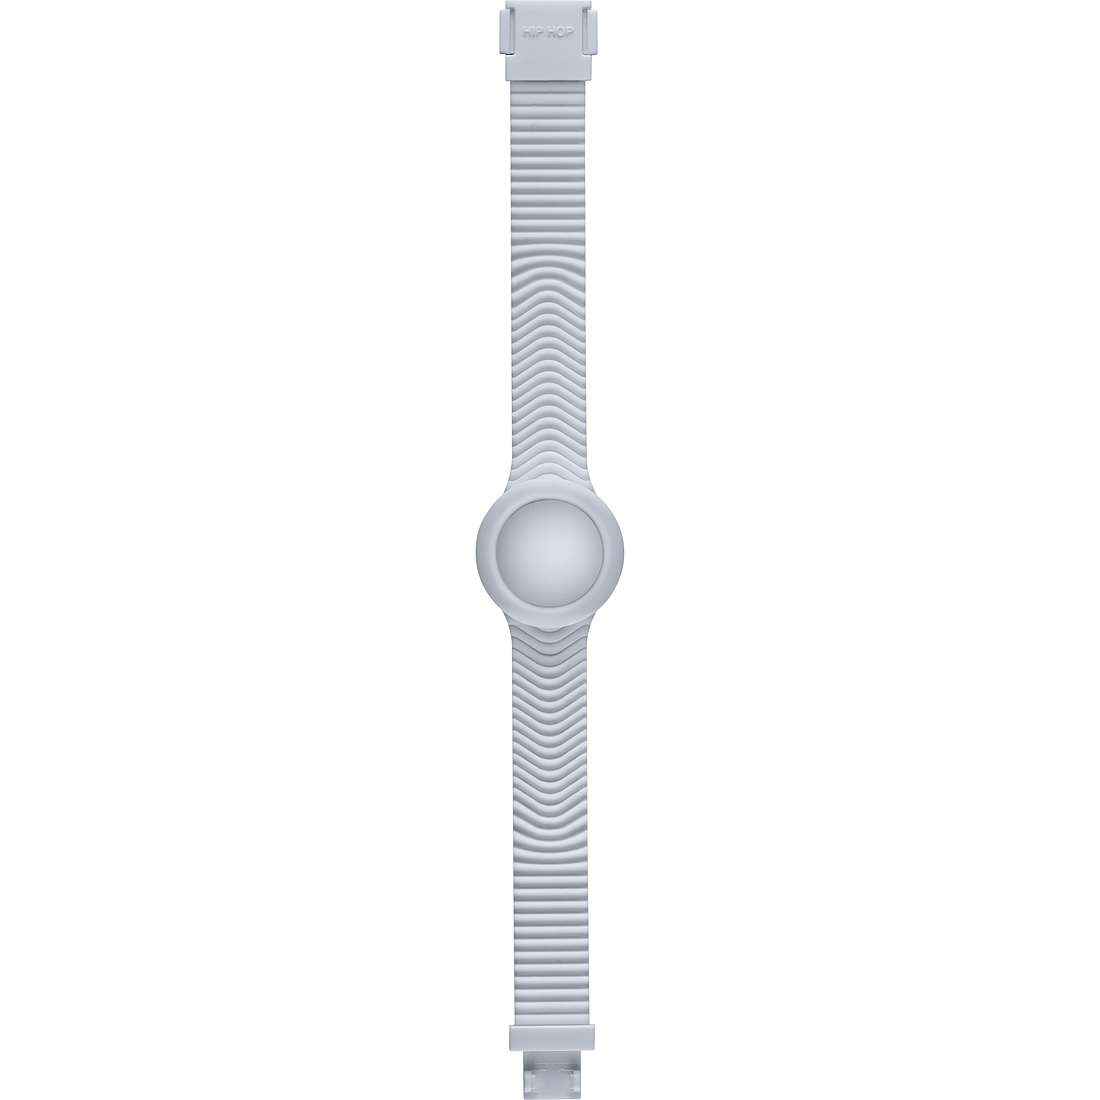 orologio accessorio donna Hip Hop Sensoriality HBU0515